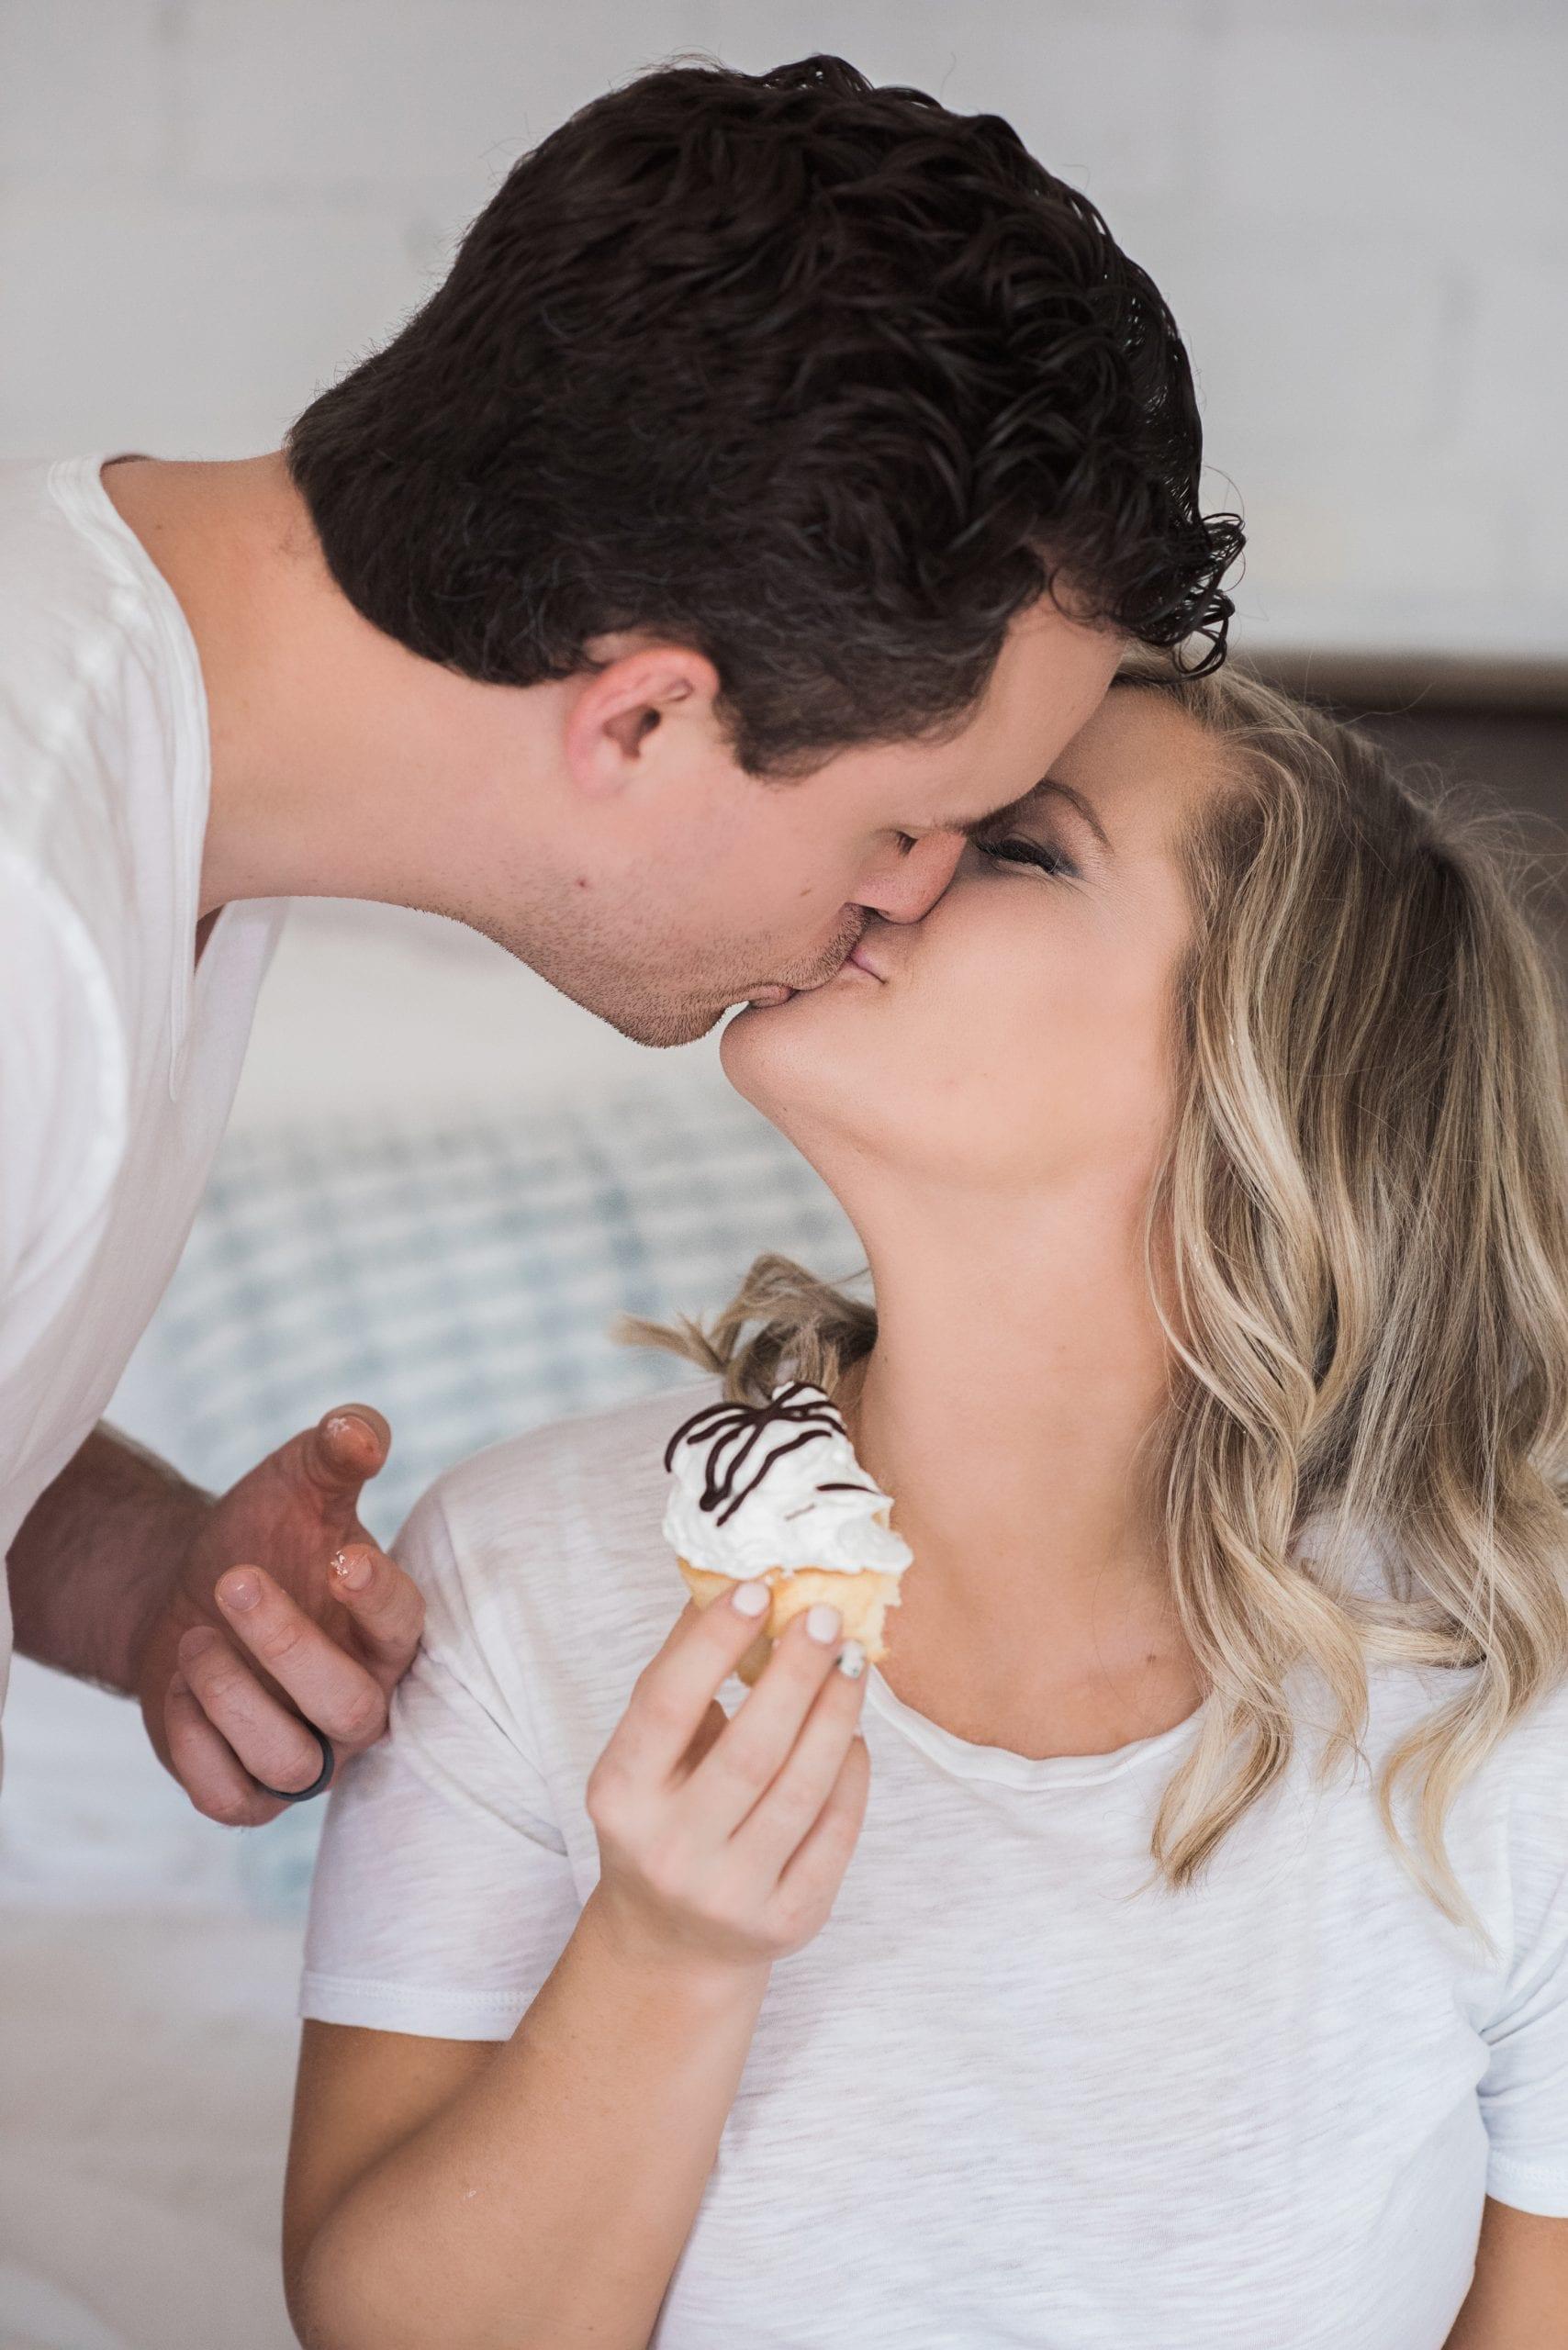 39 week bumpdate - due date -Pittsburgh blogger- maternity- cupcake cravings- Merritt Lee Photography